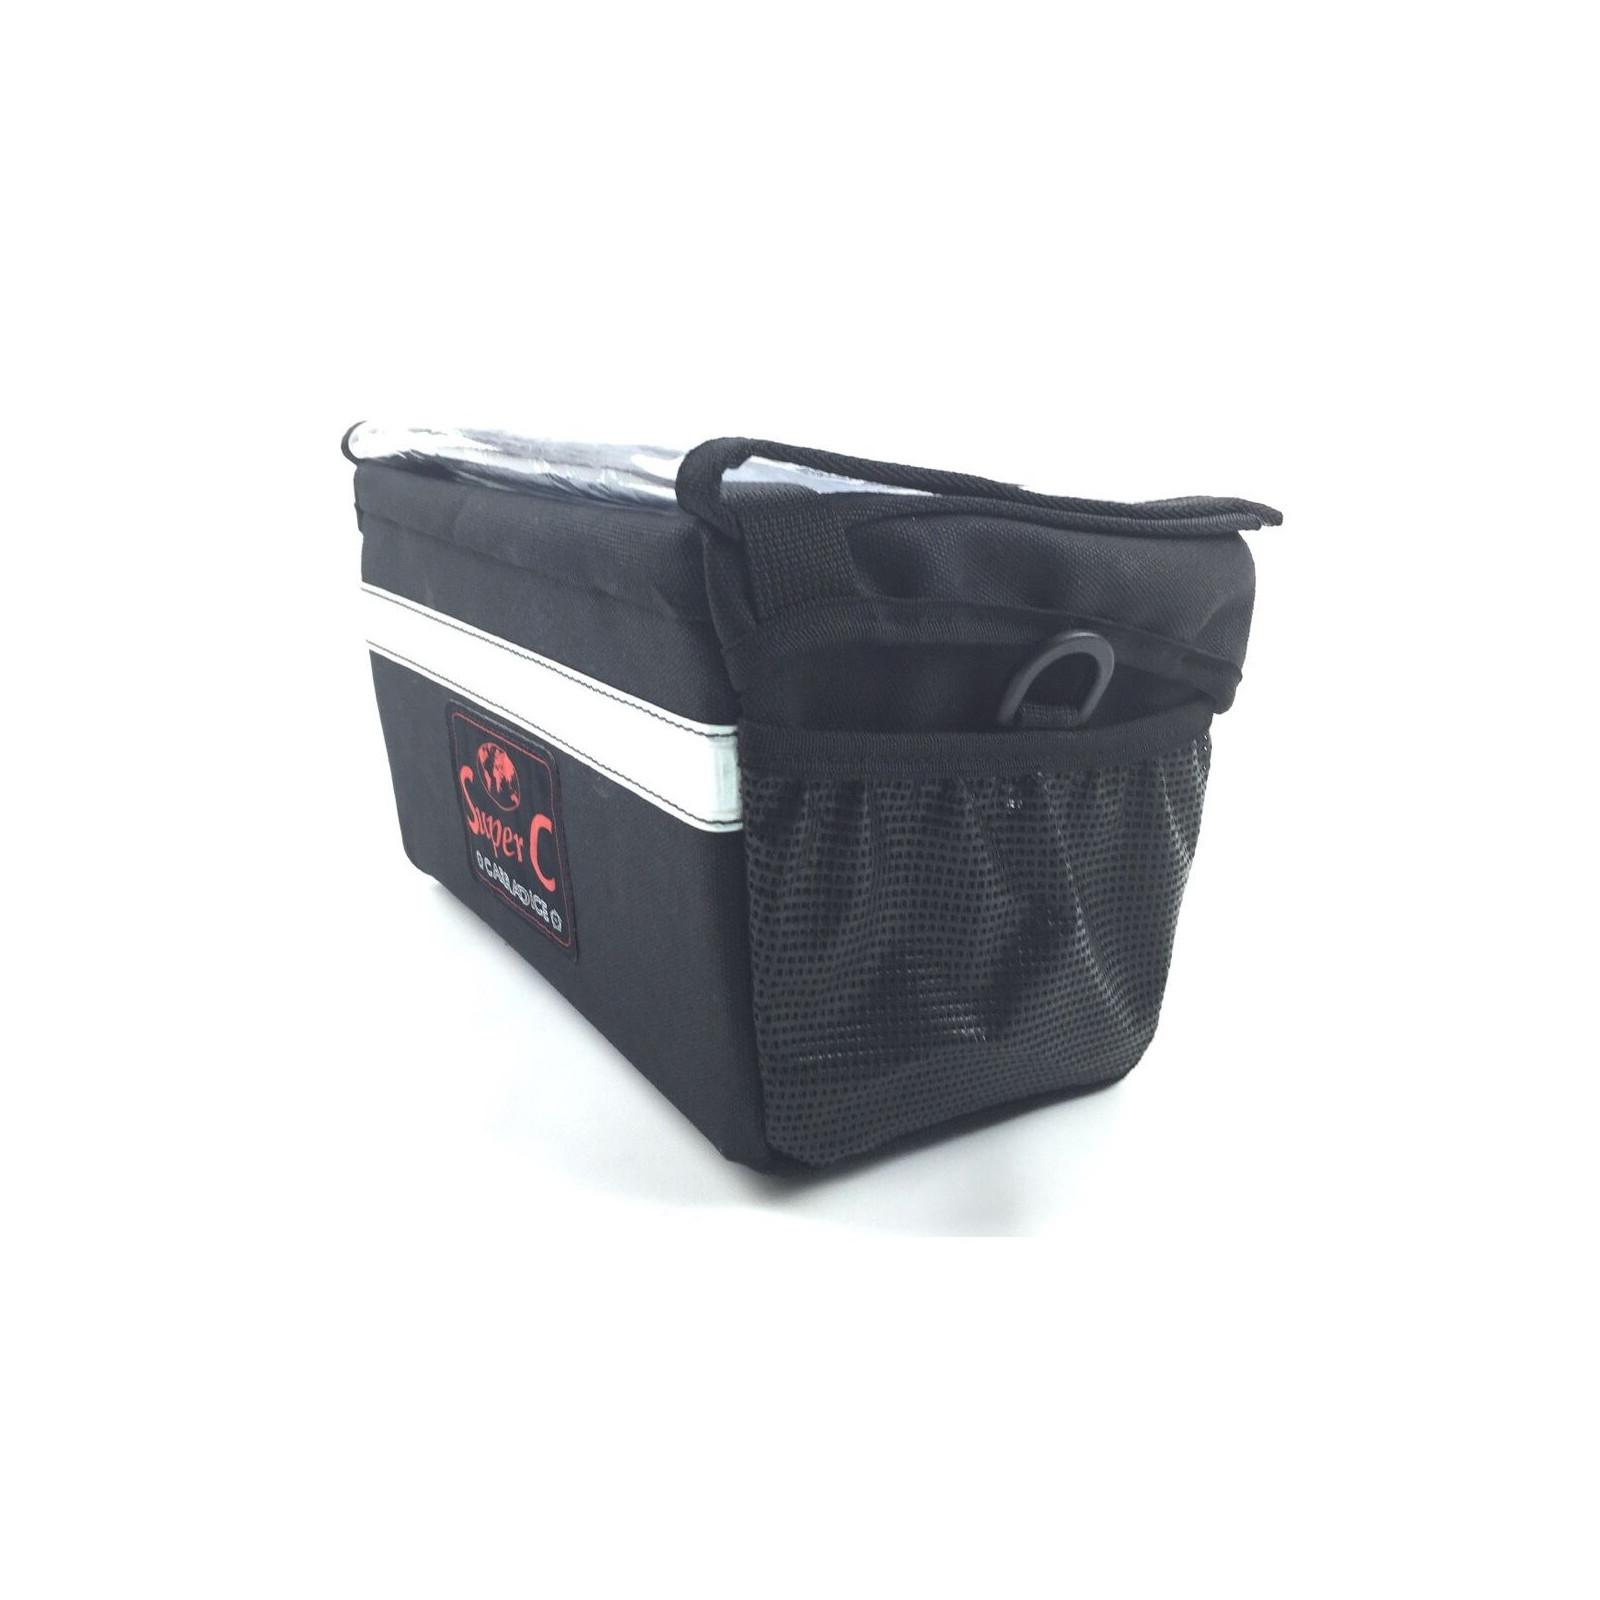 Carradice Super C Front Bag